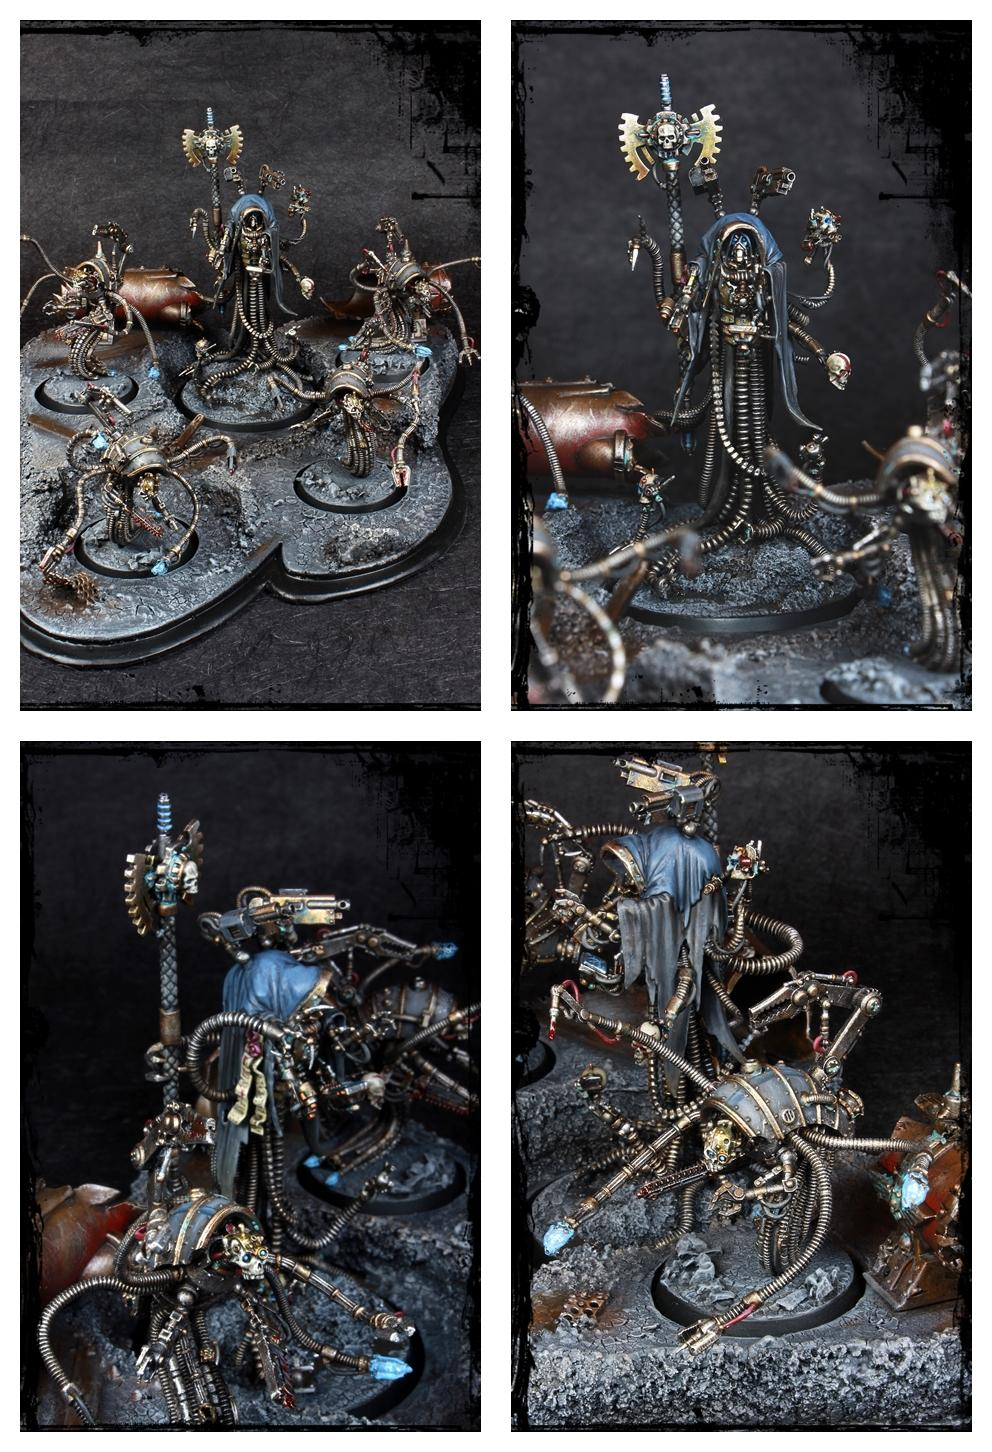 Achlys Iii, Adeptus Mechanicus, Admech, Arch-magos, Conversion, Diorama, Forge World, Mechanicum, Scratch Build, Scyllax Guardian-automata, Warhammer 40,000